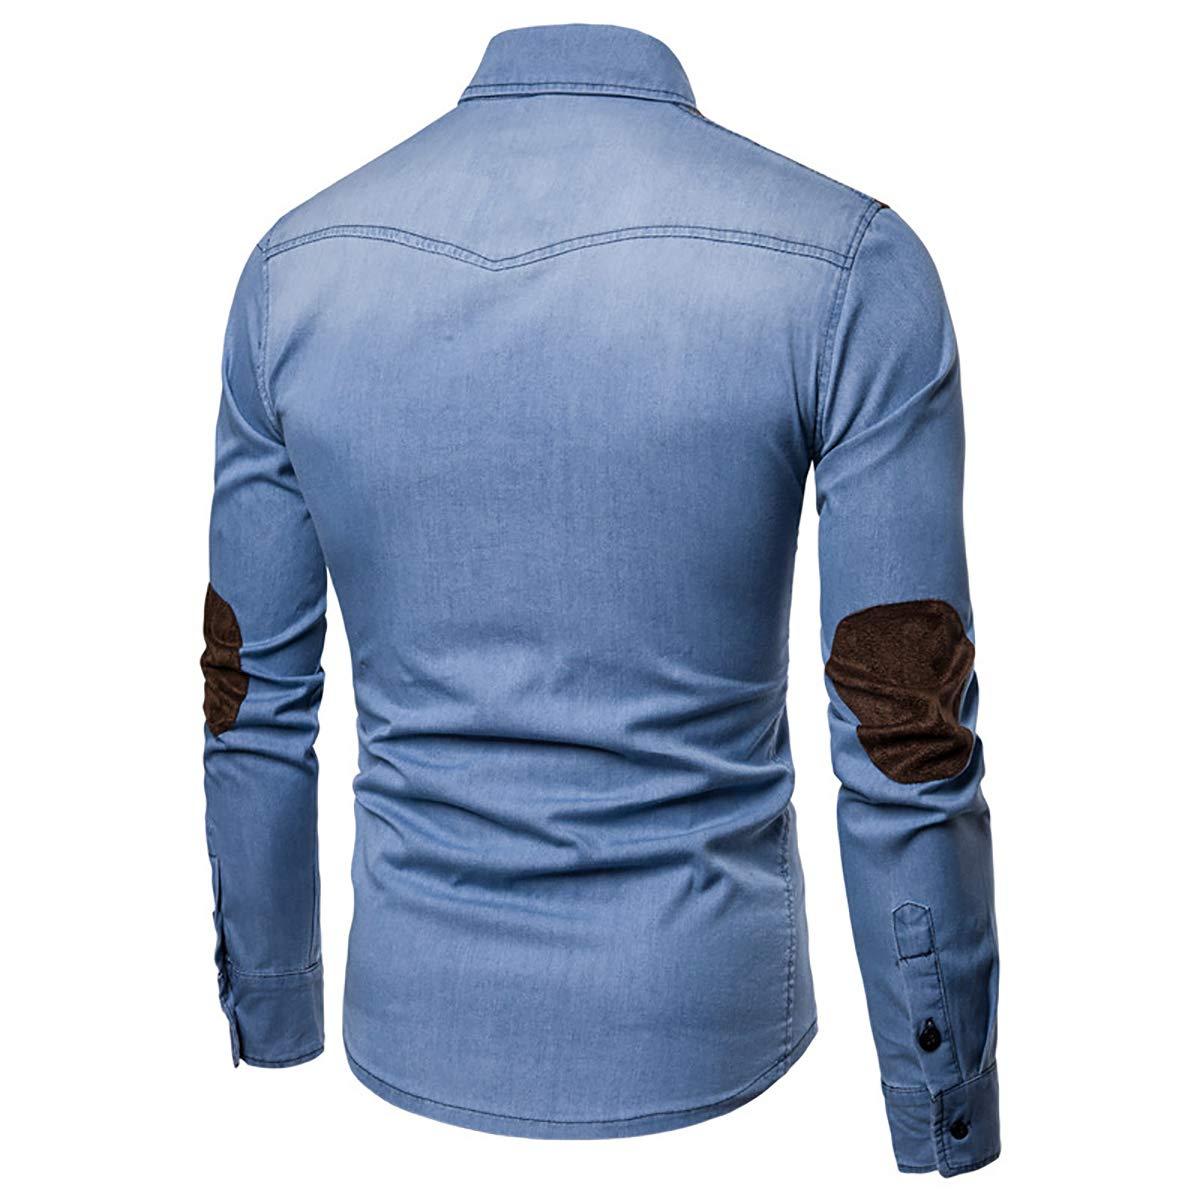 AOWOFS Mens Denim Shirt Casual Fashion Stitching Suede Washed Button Long Sleeve Work Shirt